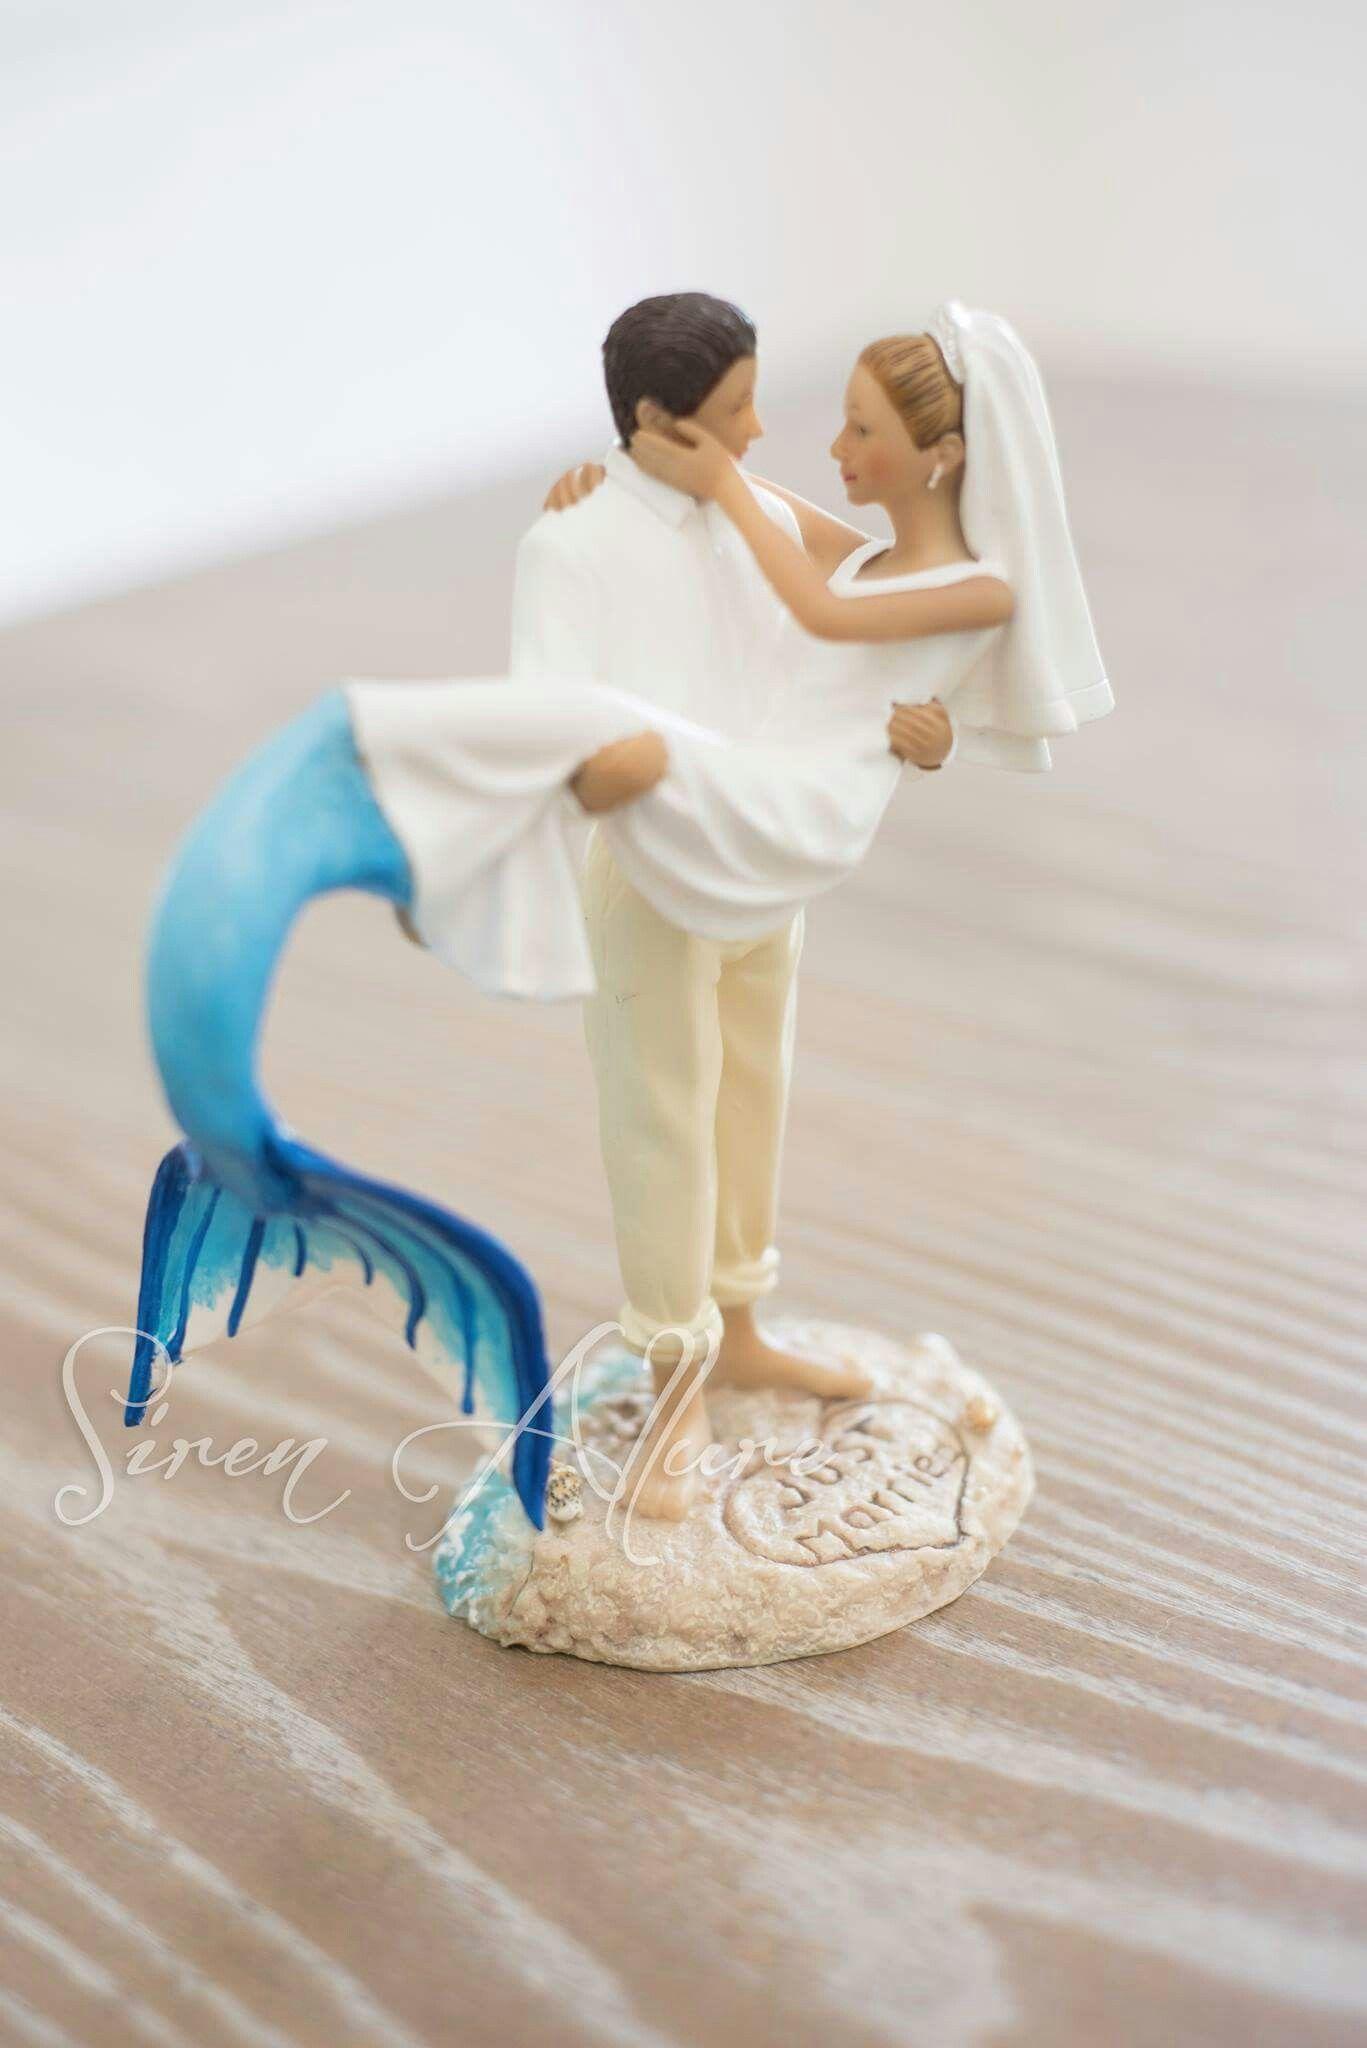 Mermaid Bride Cakes